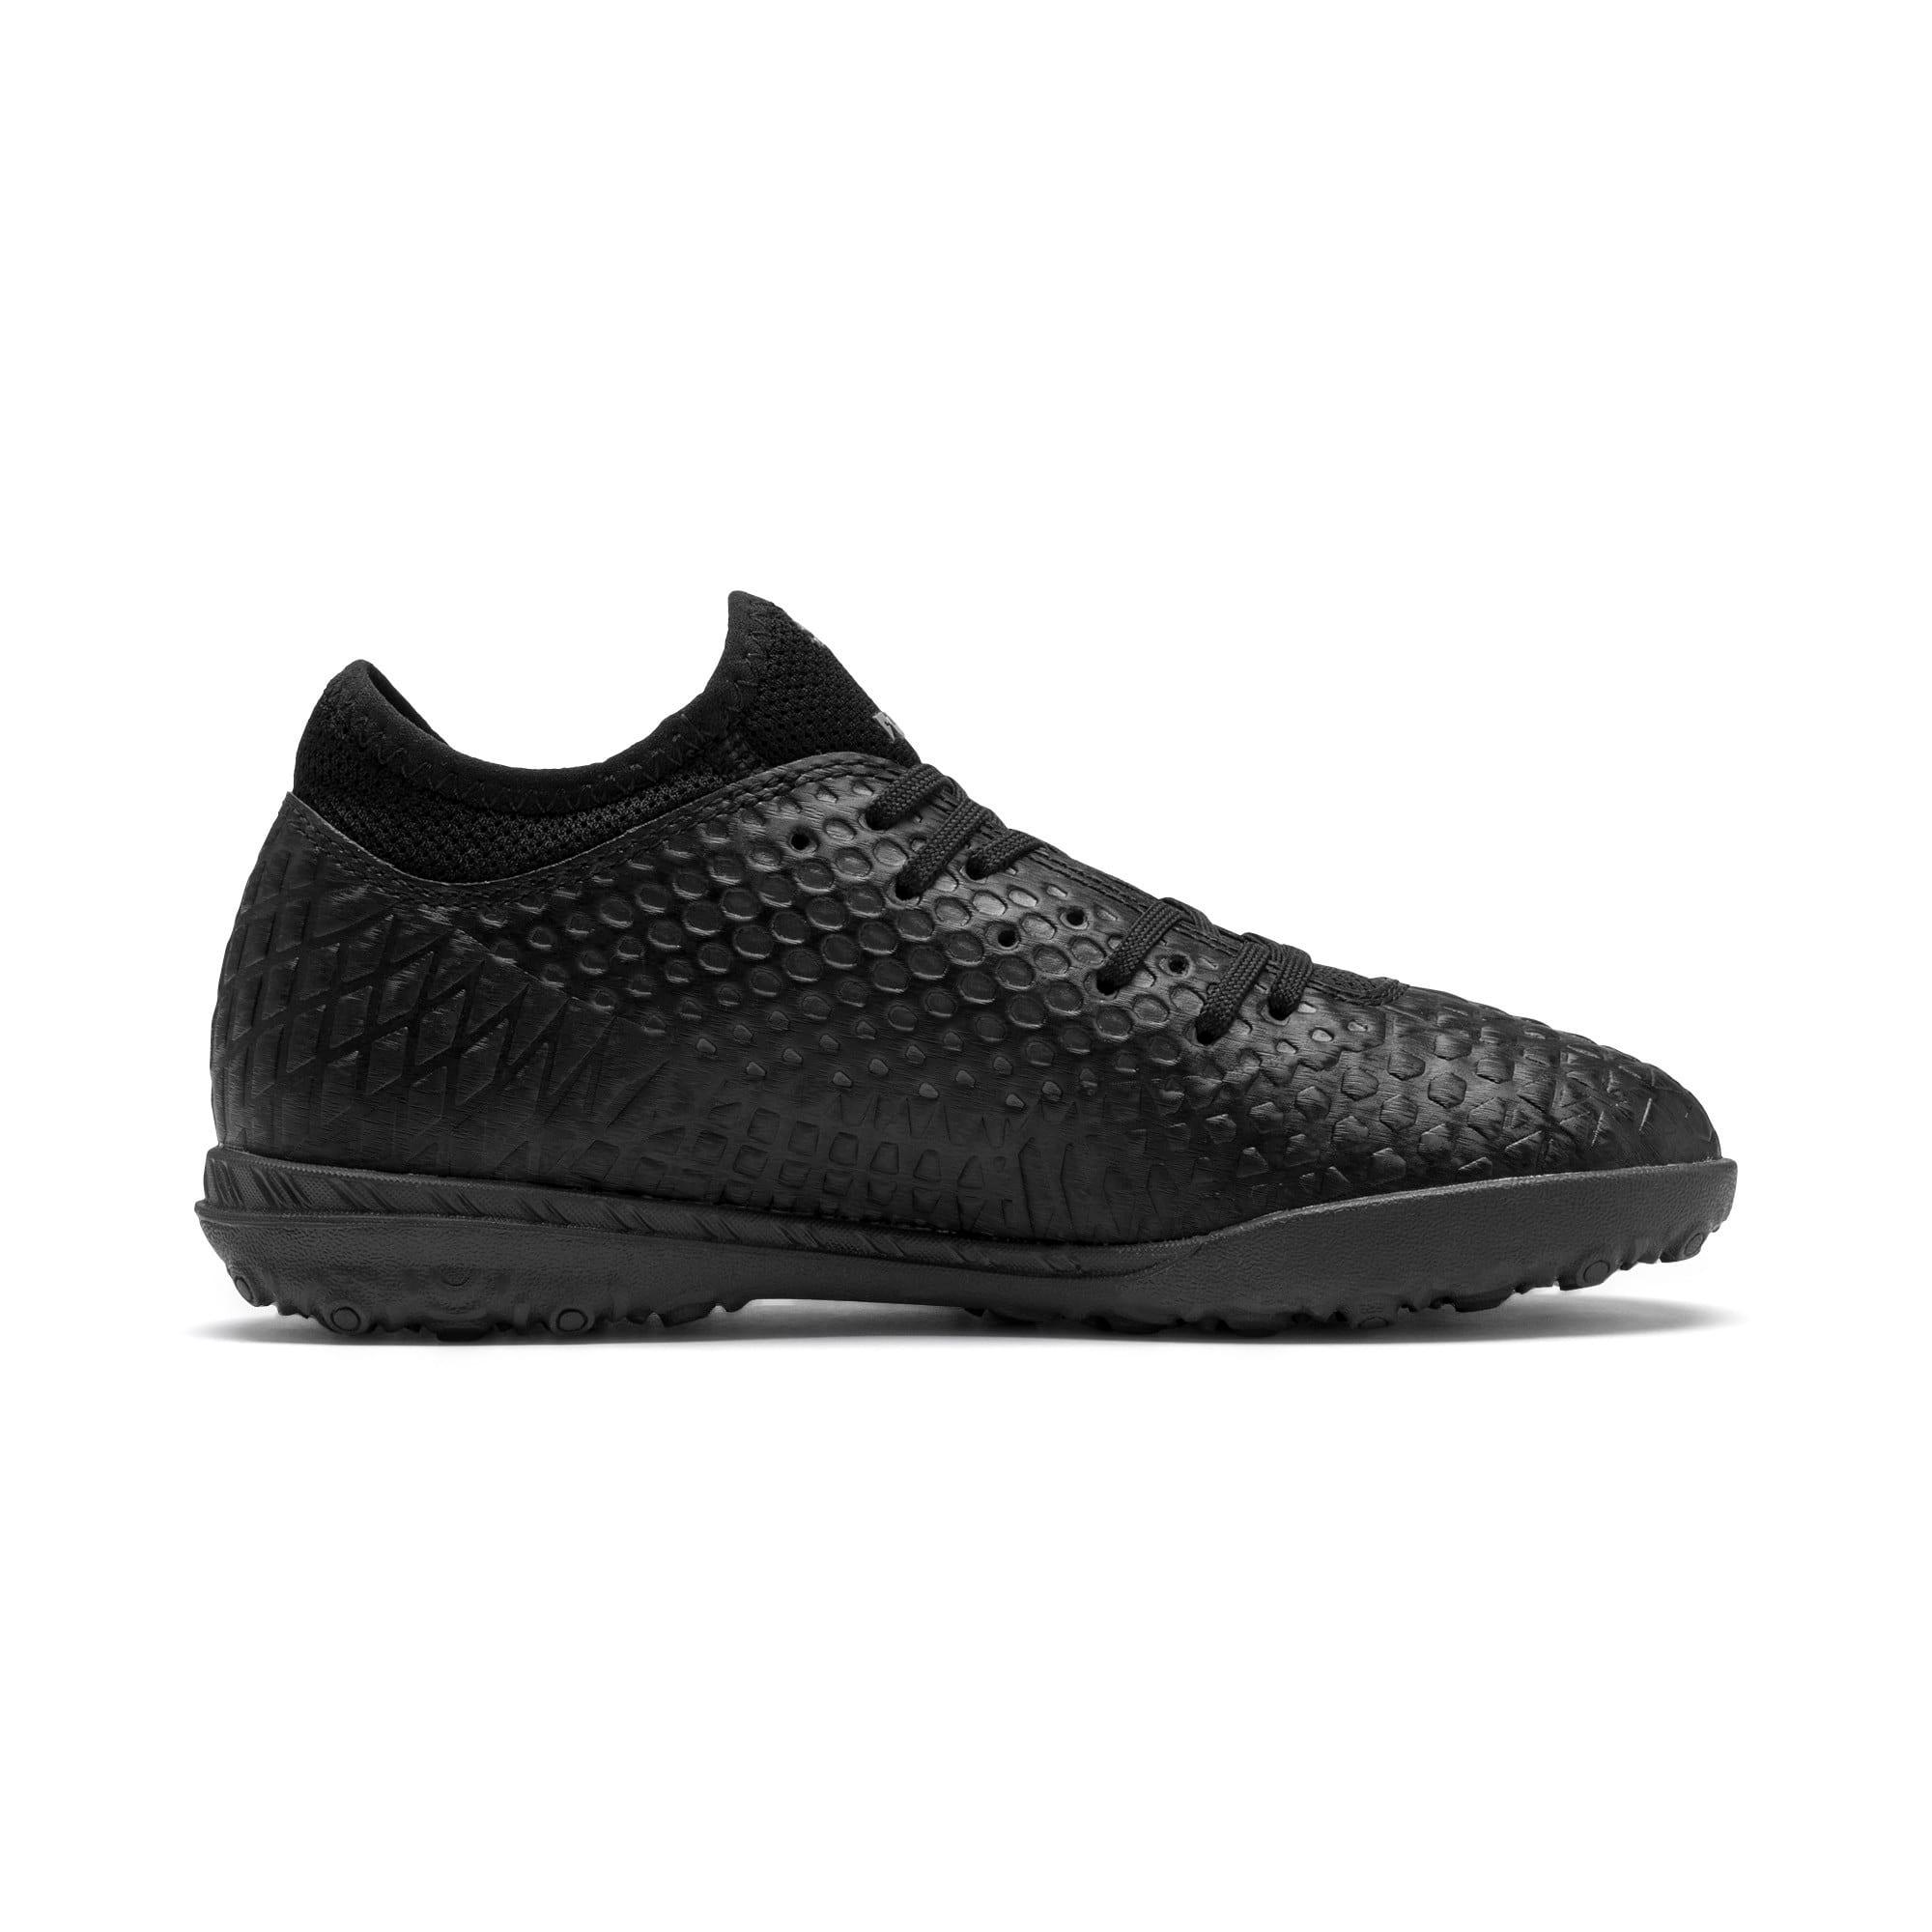 Imagen en miniatura 5 de Botas de fútbol de juvenil FUTURE 4.4 TT, Black-Black-Puma Aged Silver, mediana